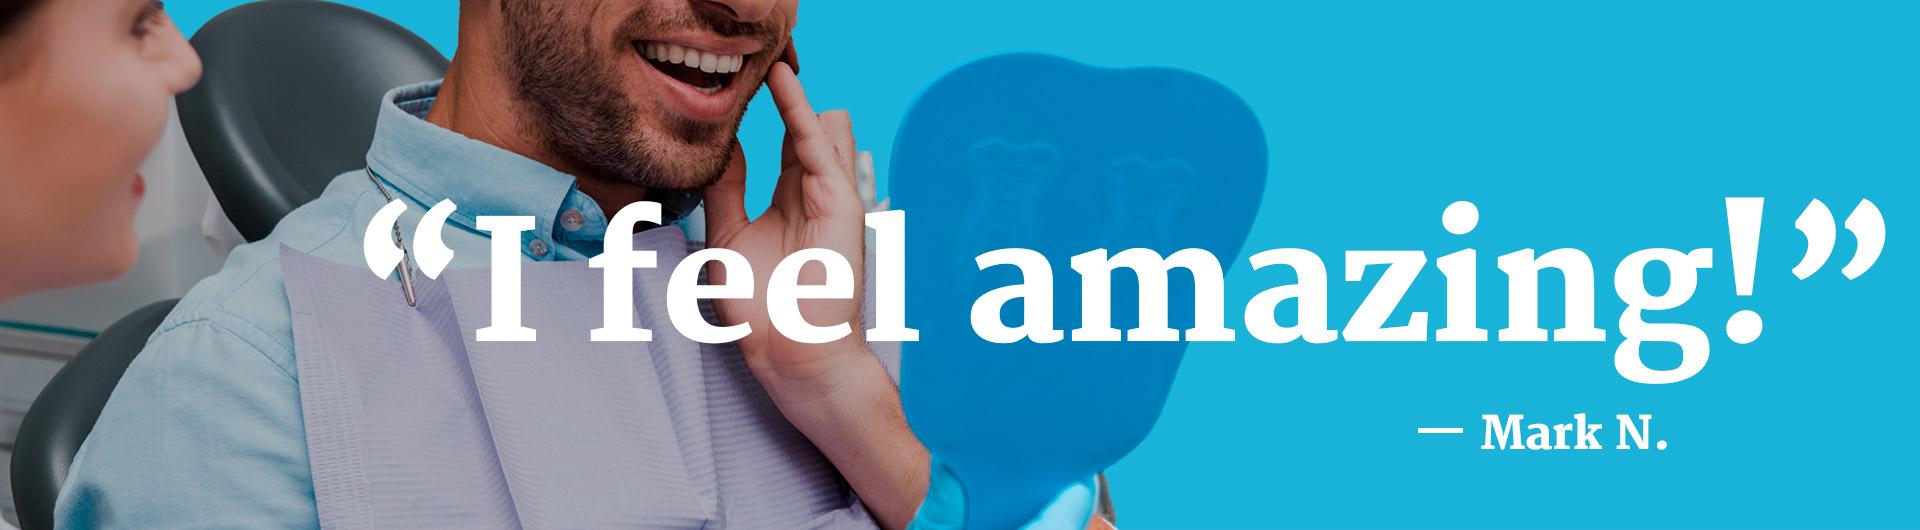 I feel amazing - All Smiles Bethesda